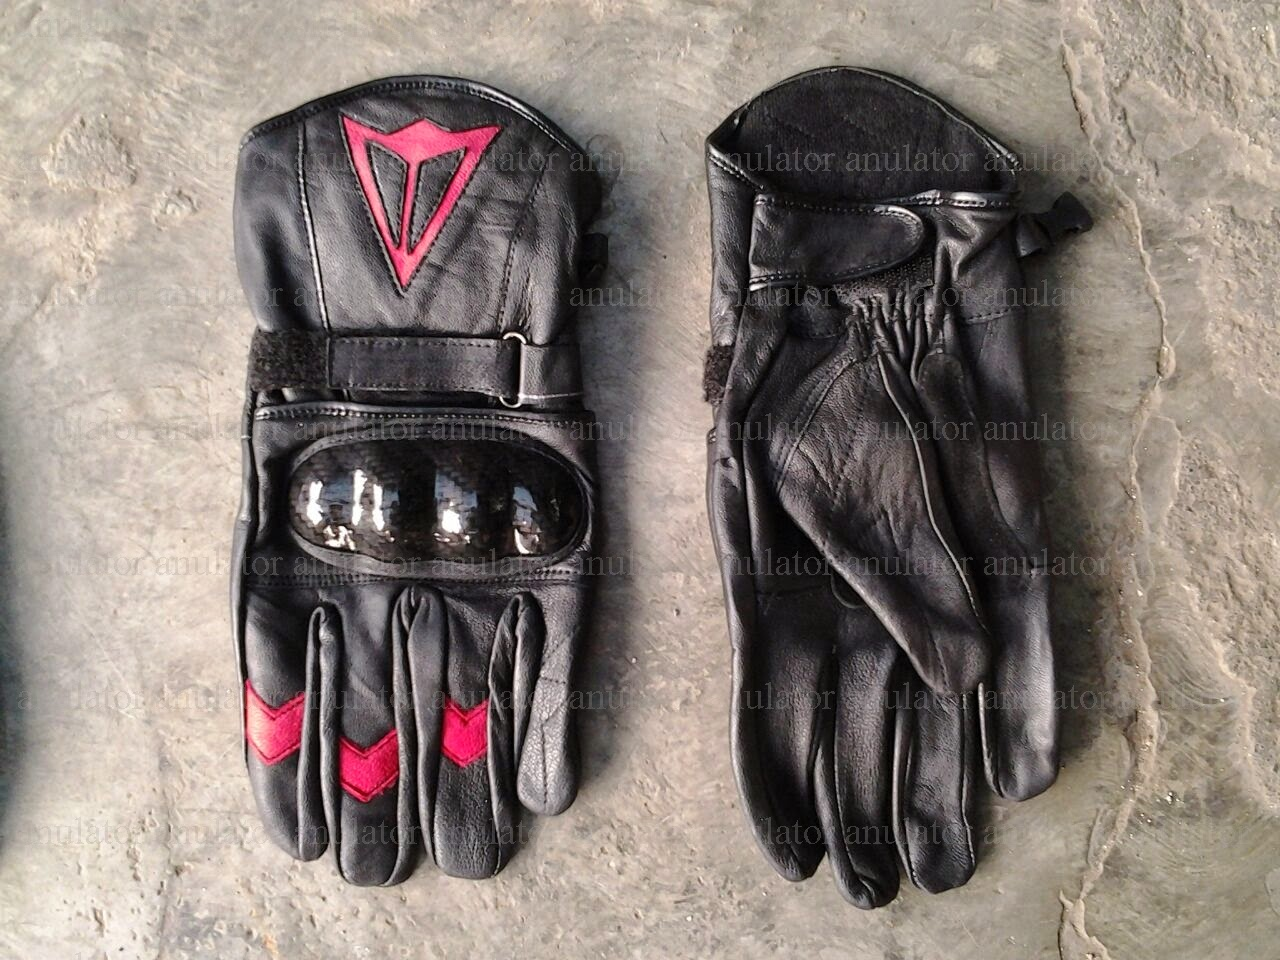 Glove Dainesse 3